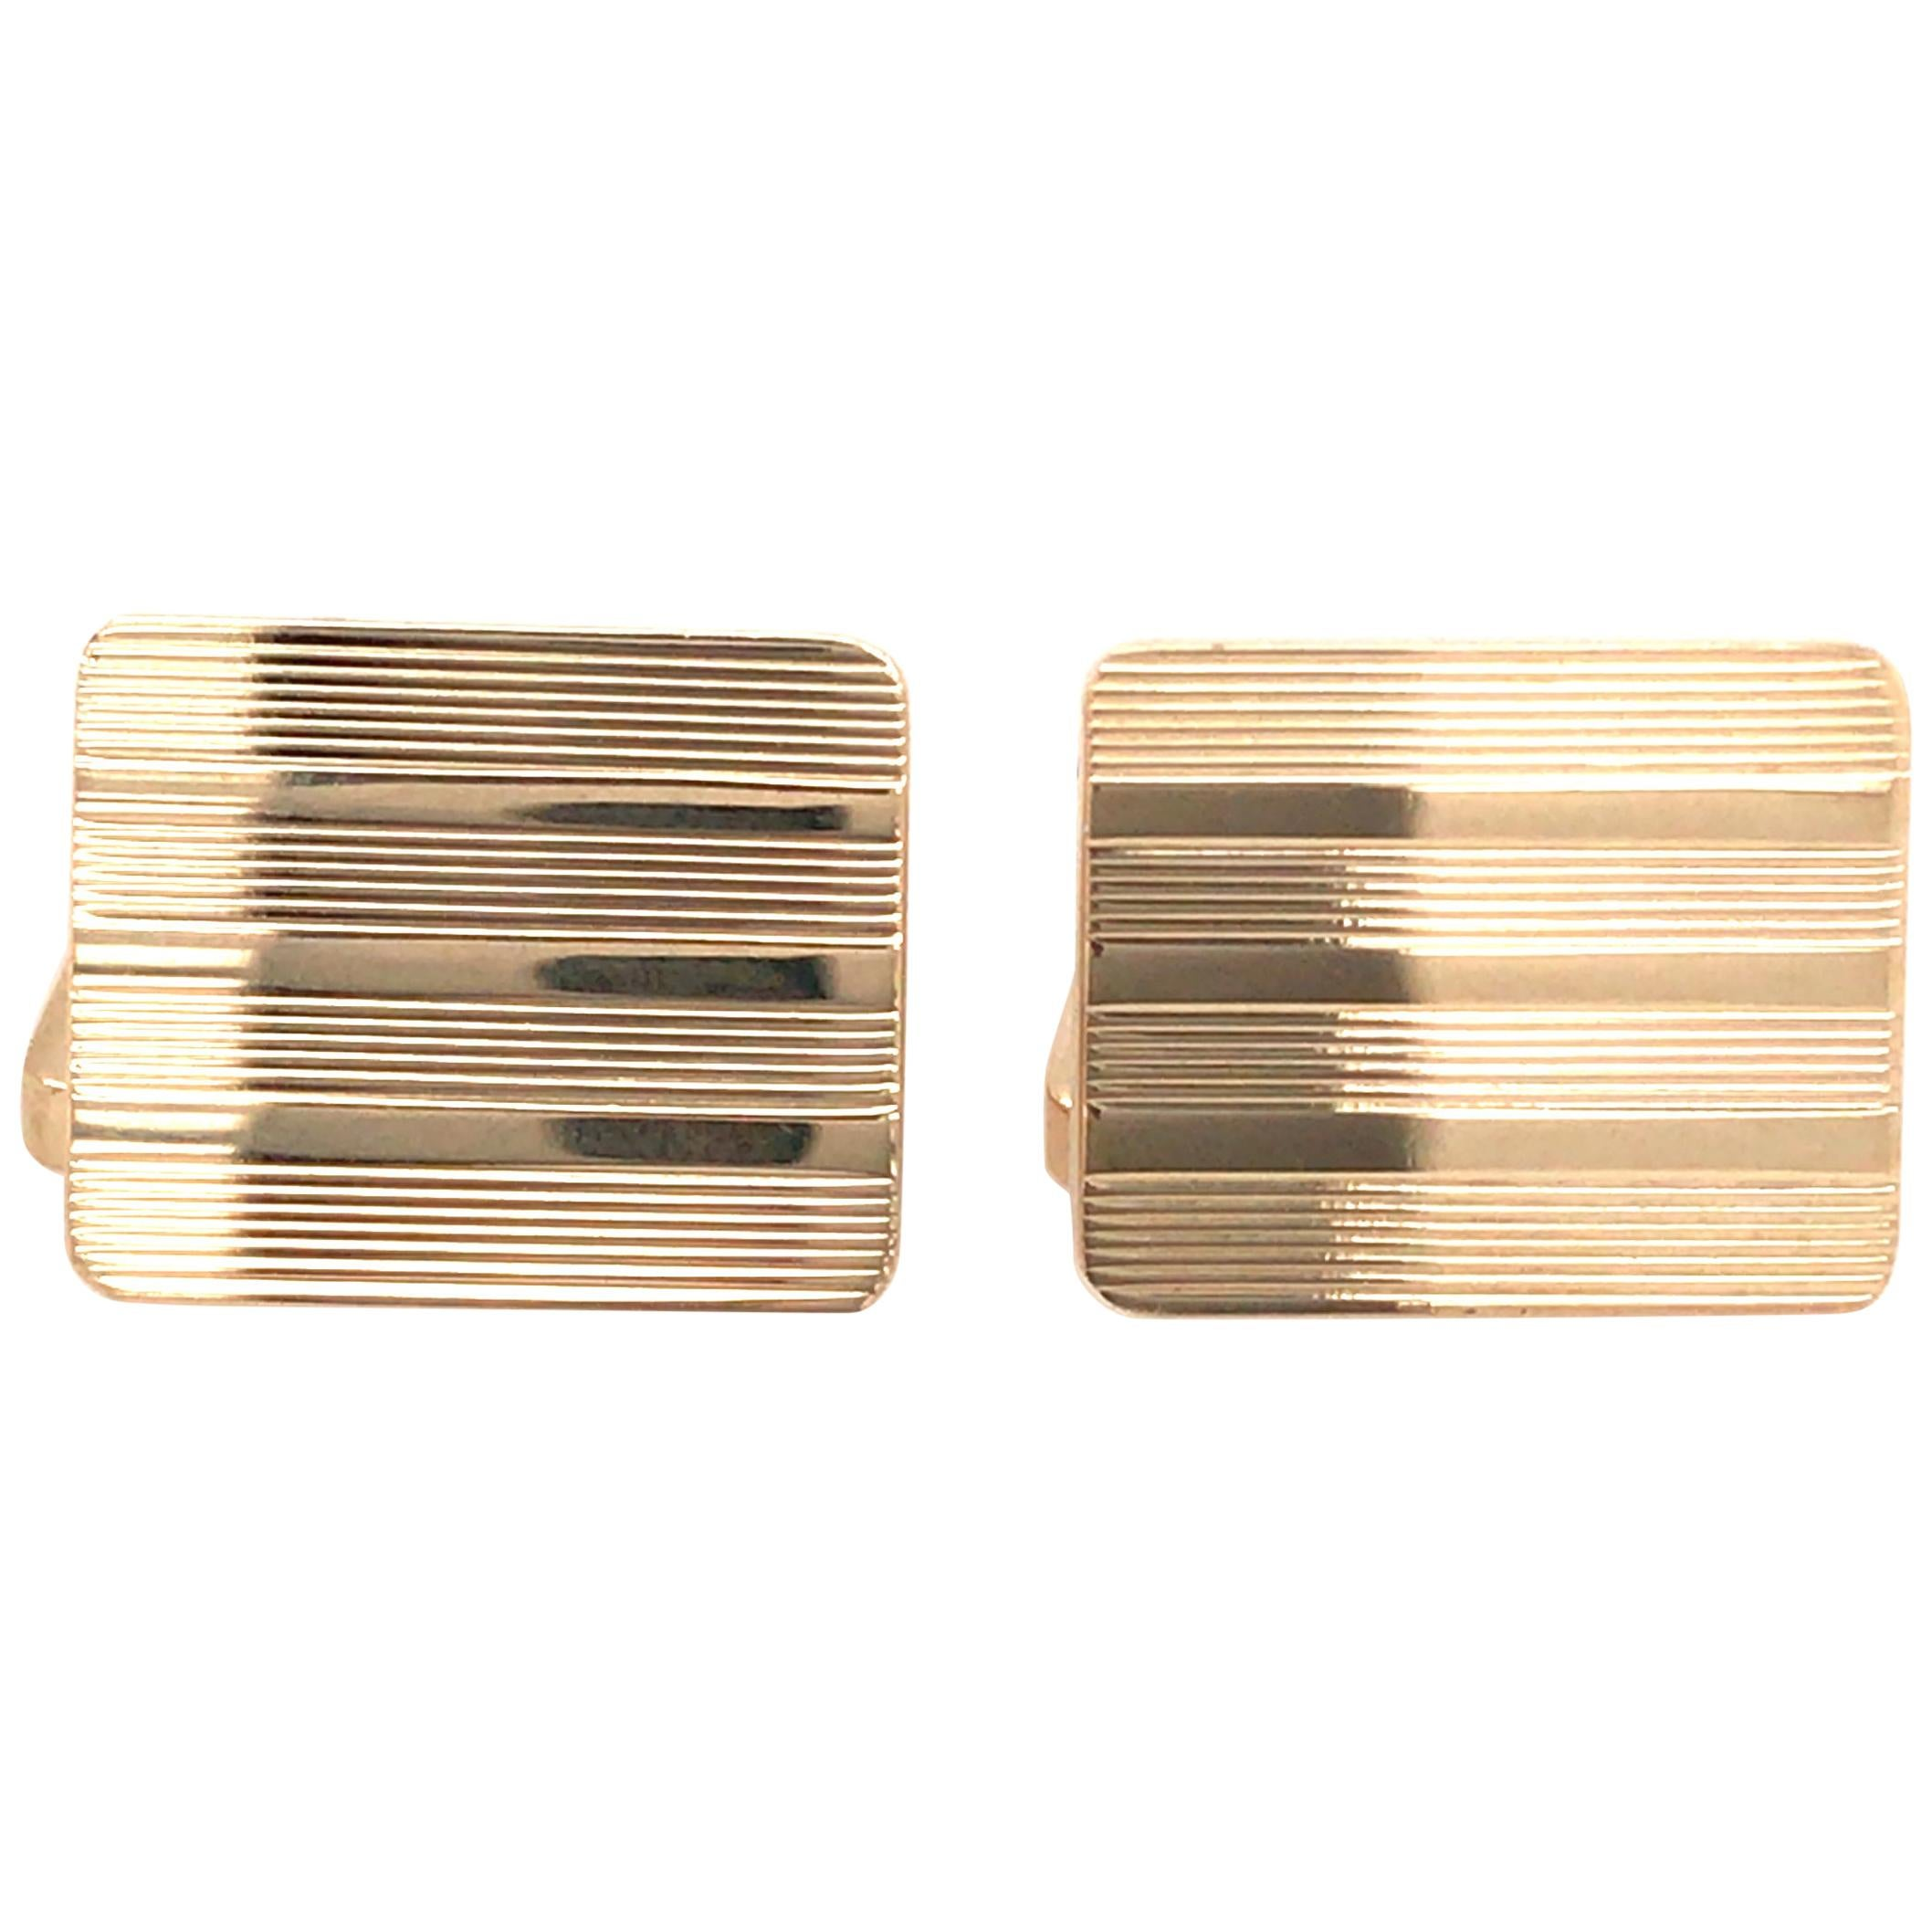 14 Karat Tiffany & Co. Rectangular Cufflinks Yellow Gold